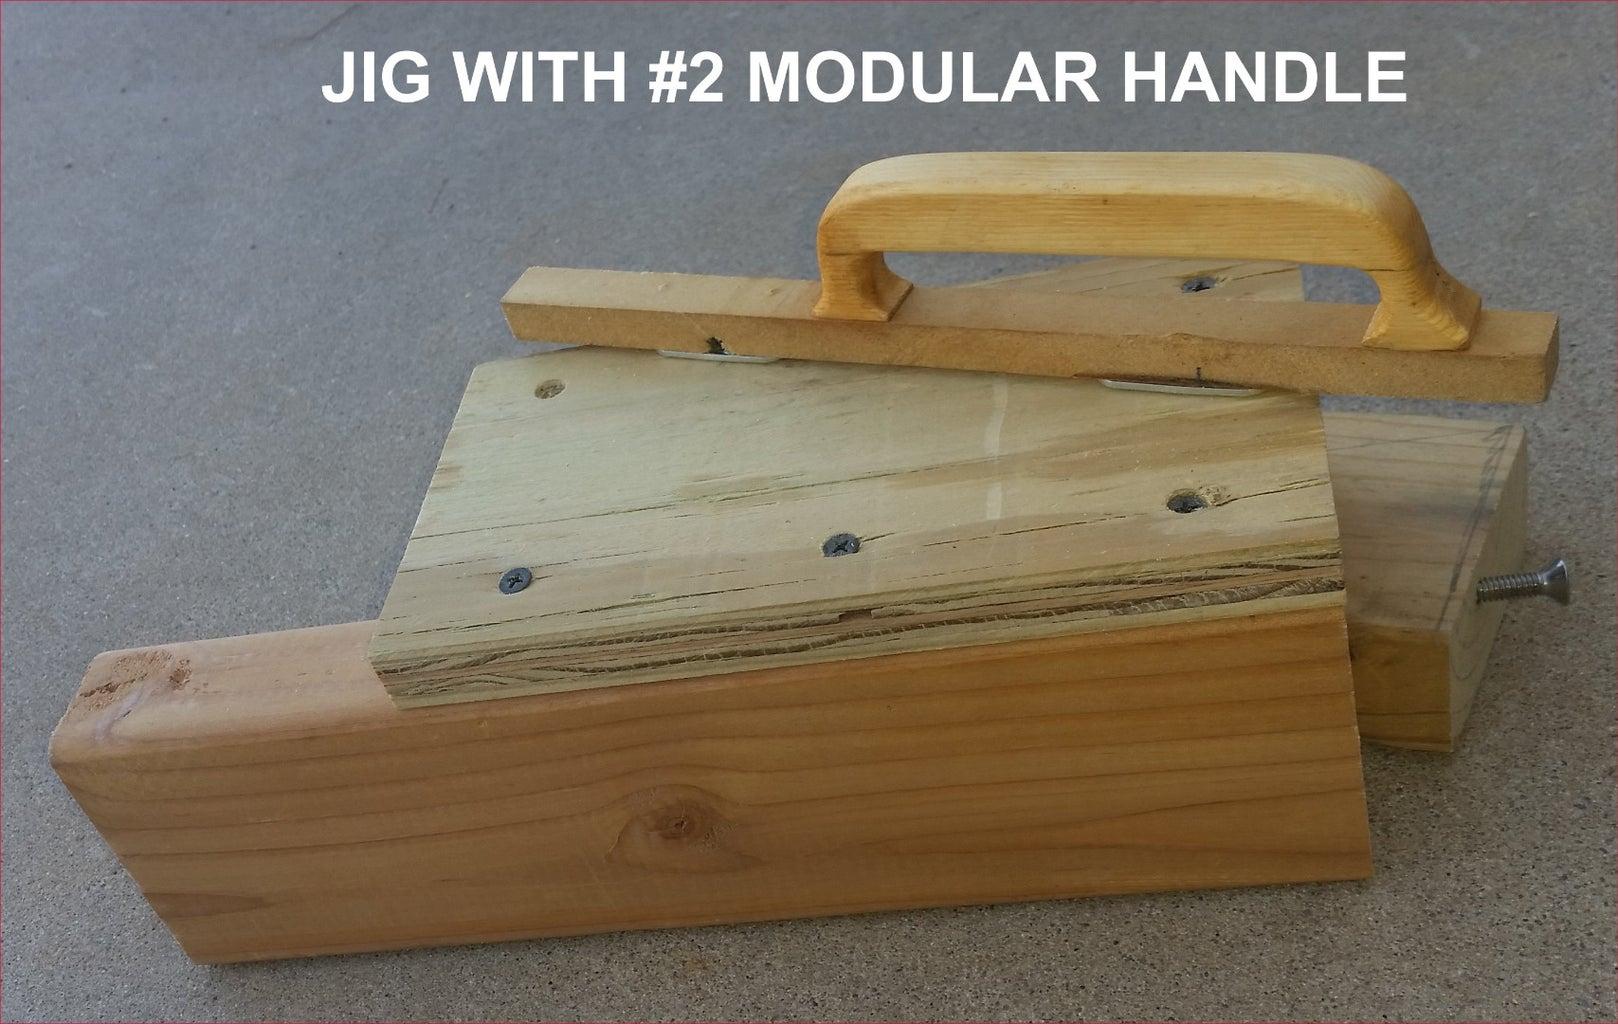 Second Modular Handle